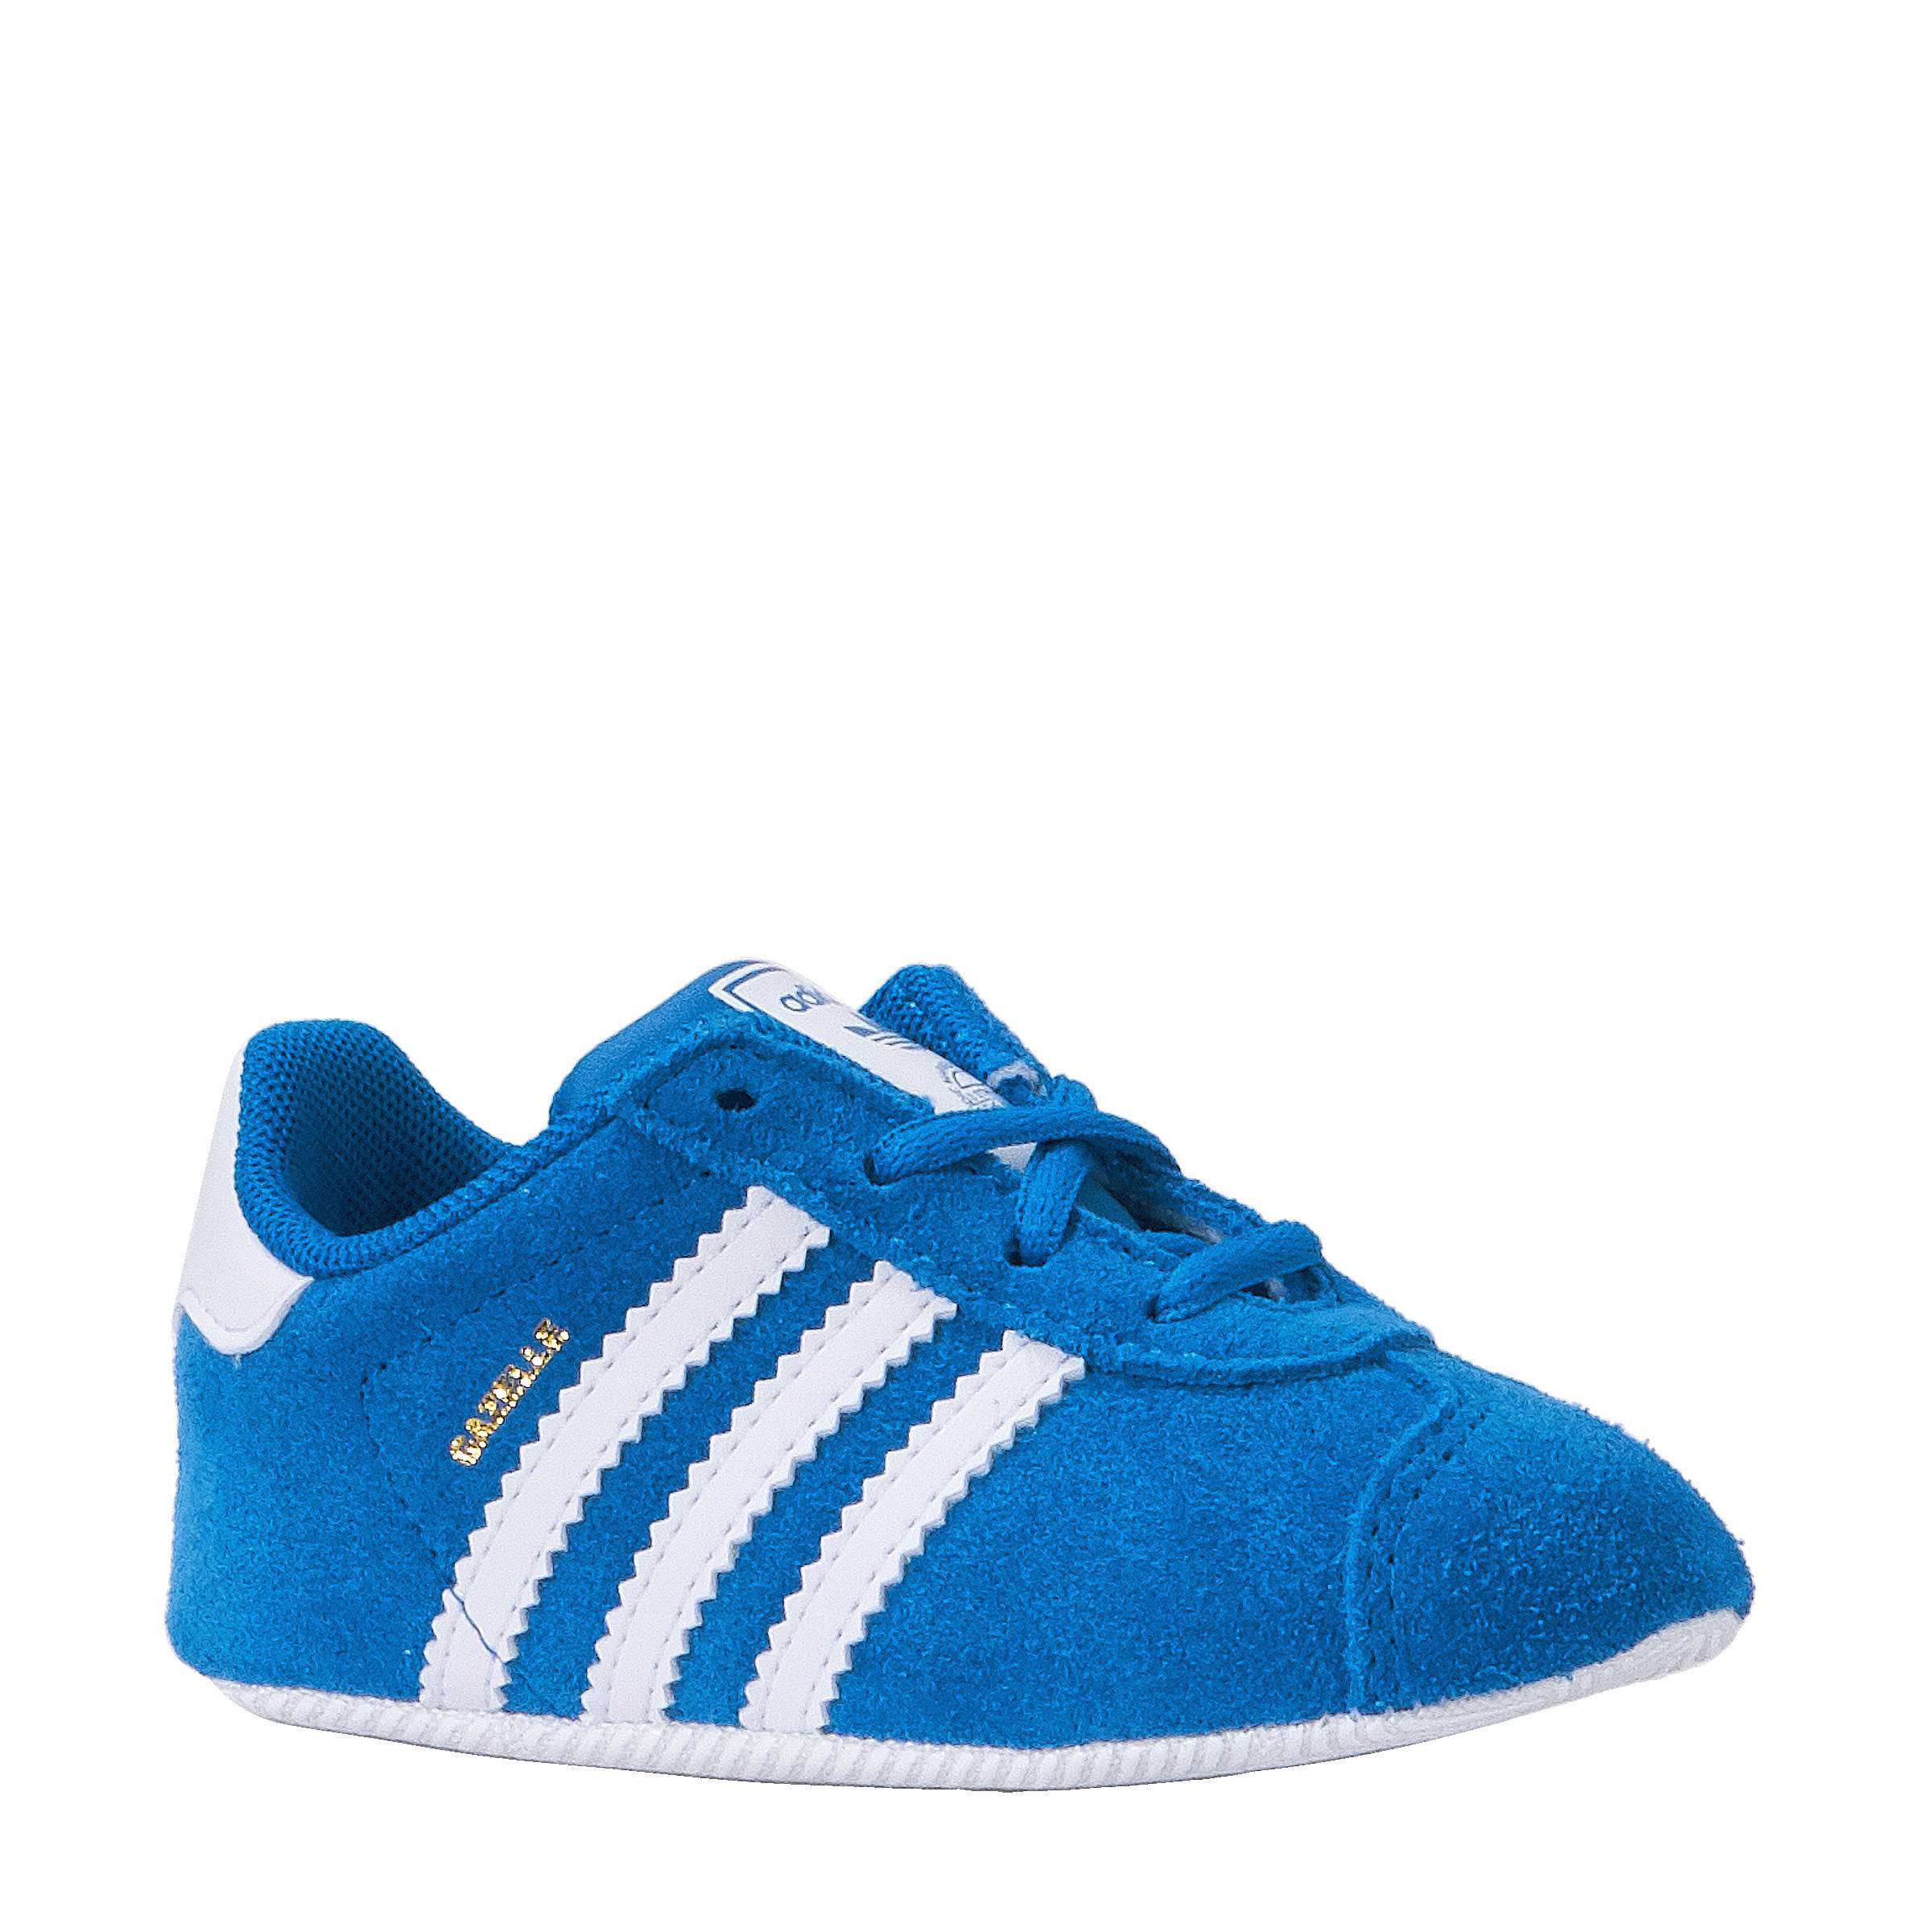 Sneakers Originals Adidas Gazelle Grey Blauwwit r5rOqn